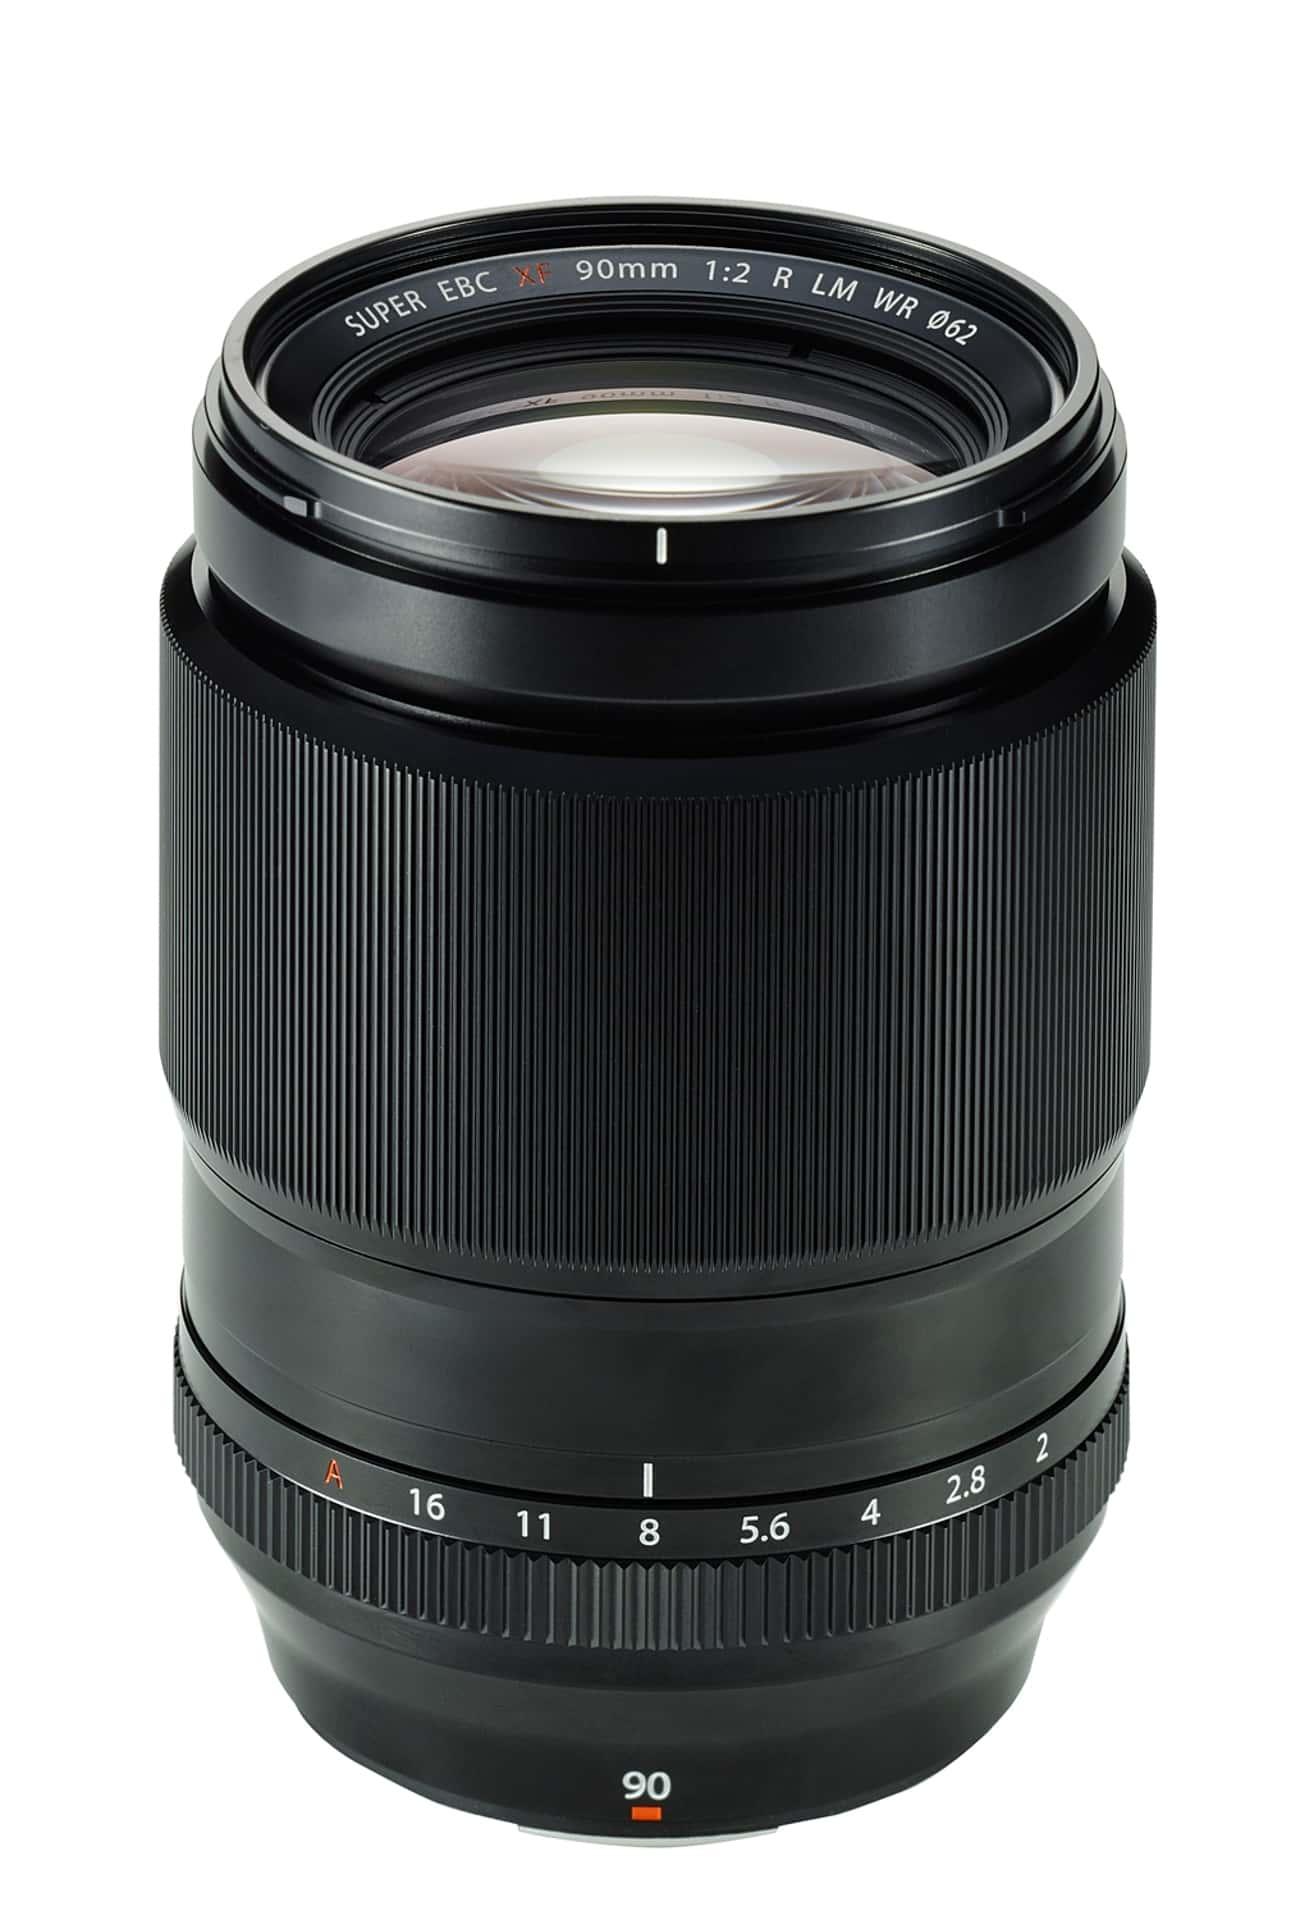 Fuji 56mm and 90mm Lenses